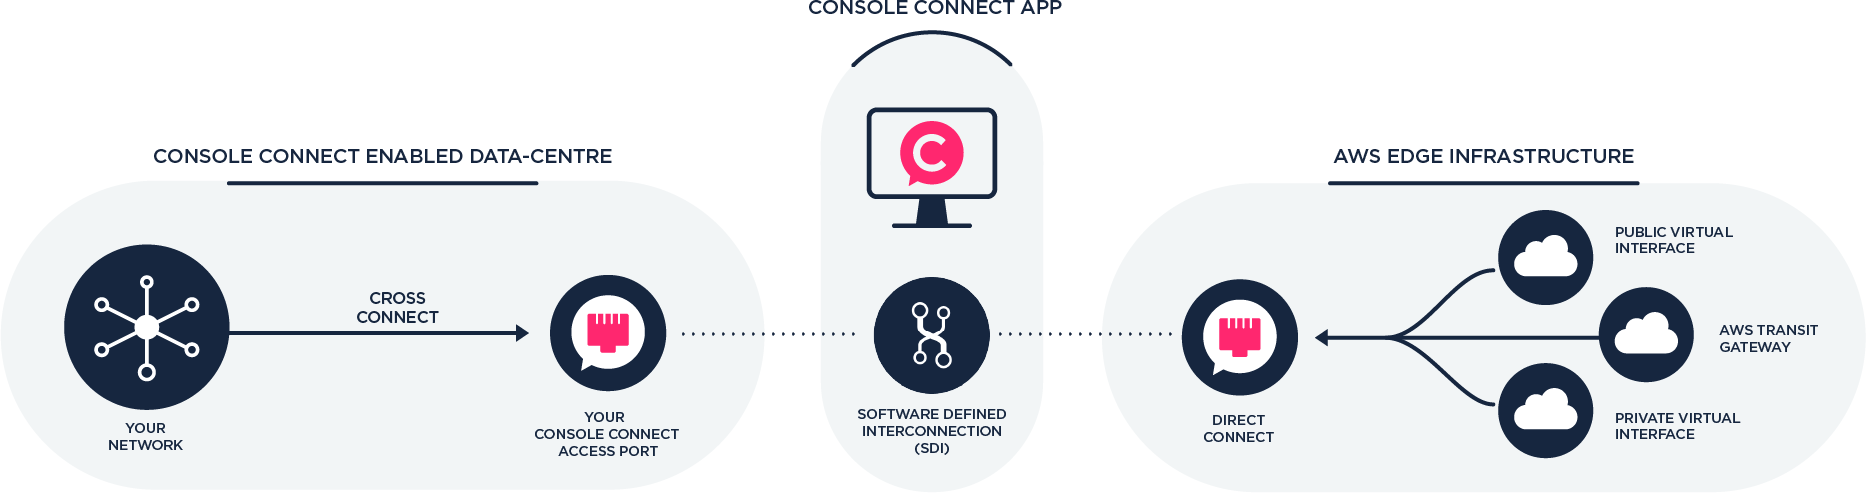 CC cloud diagram